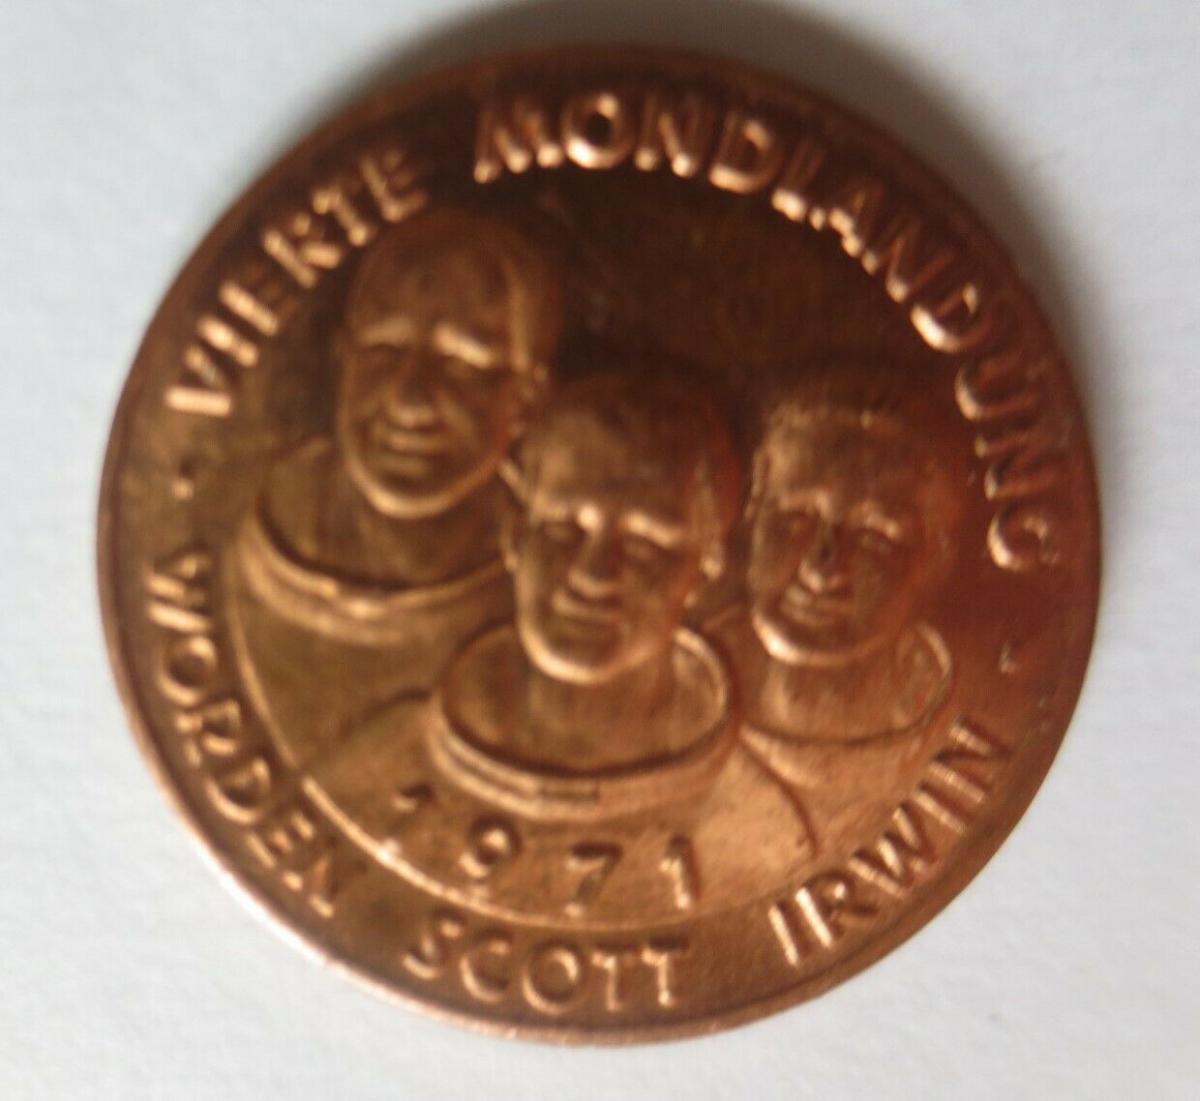 Medaille 1971 Deutschland Apollo 15 - Raumfahrt - Scott - Worden - Irwin♥(14500) 0